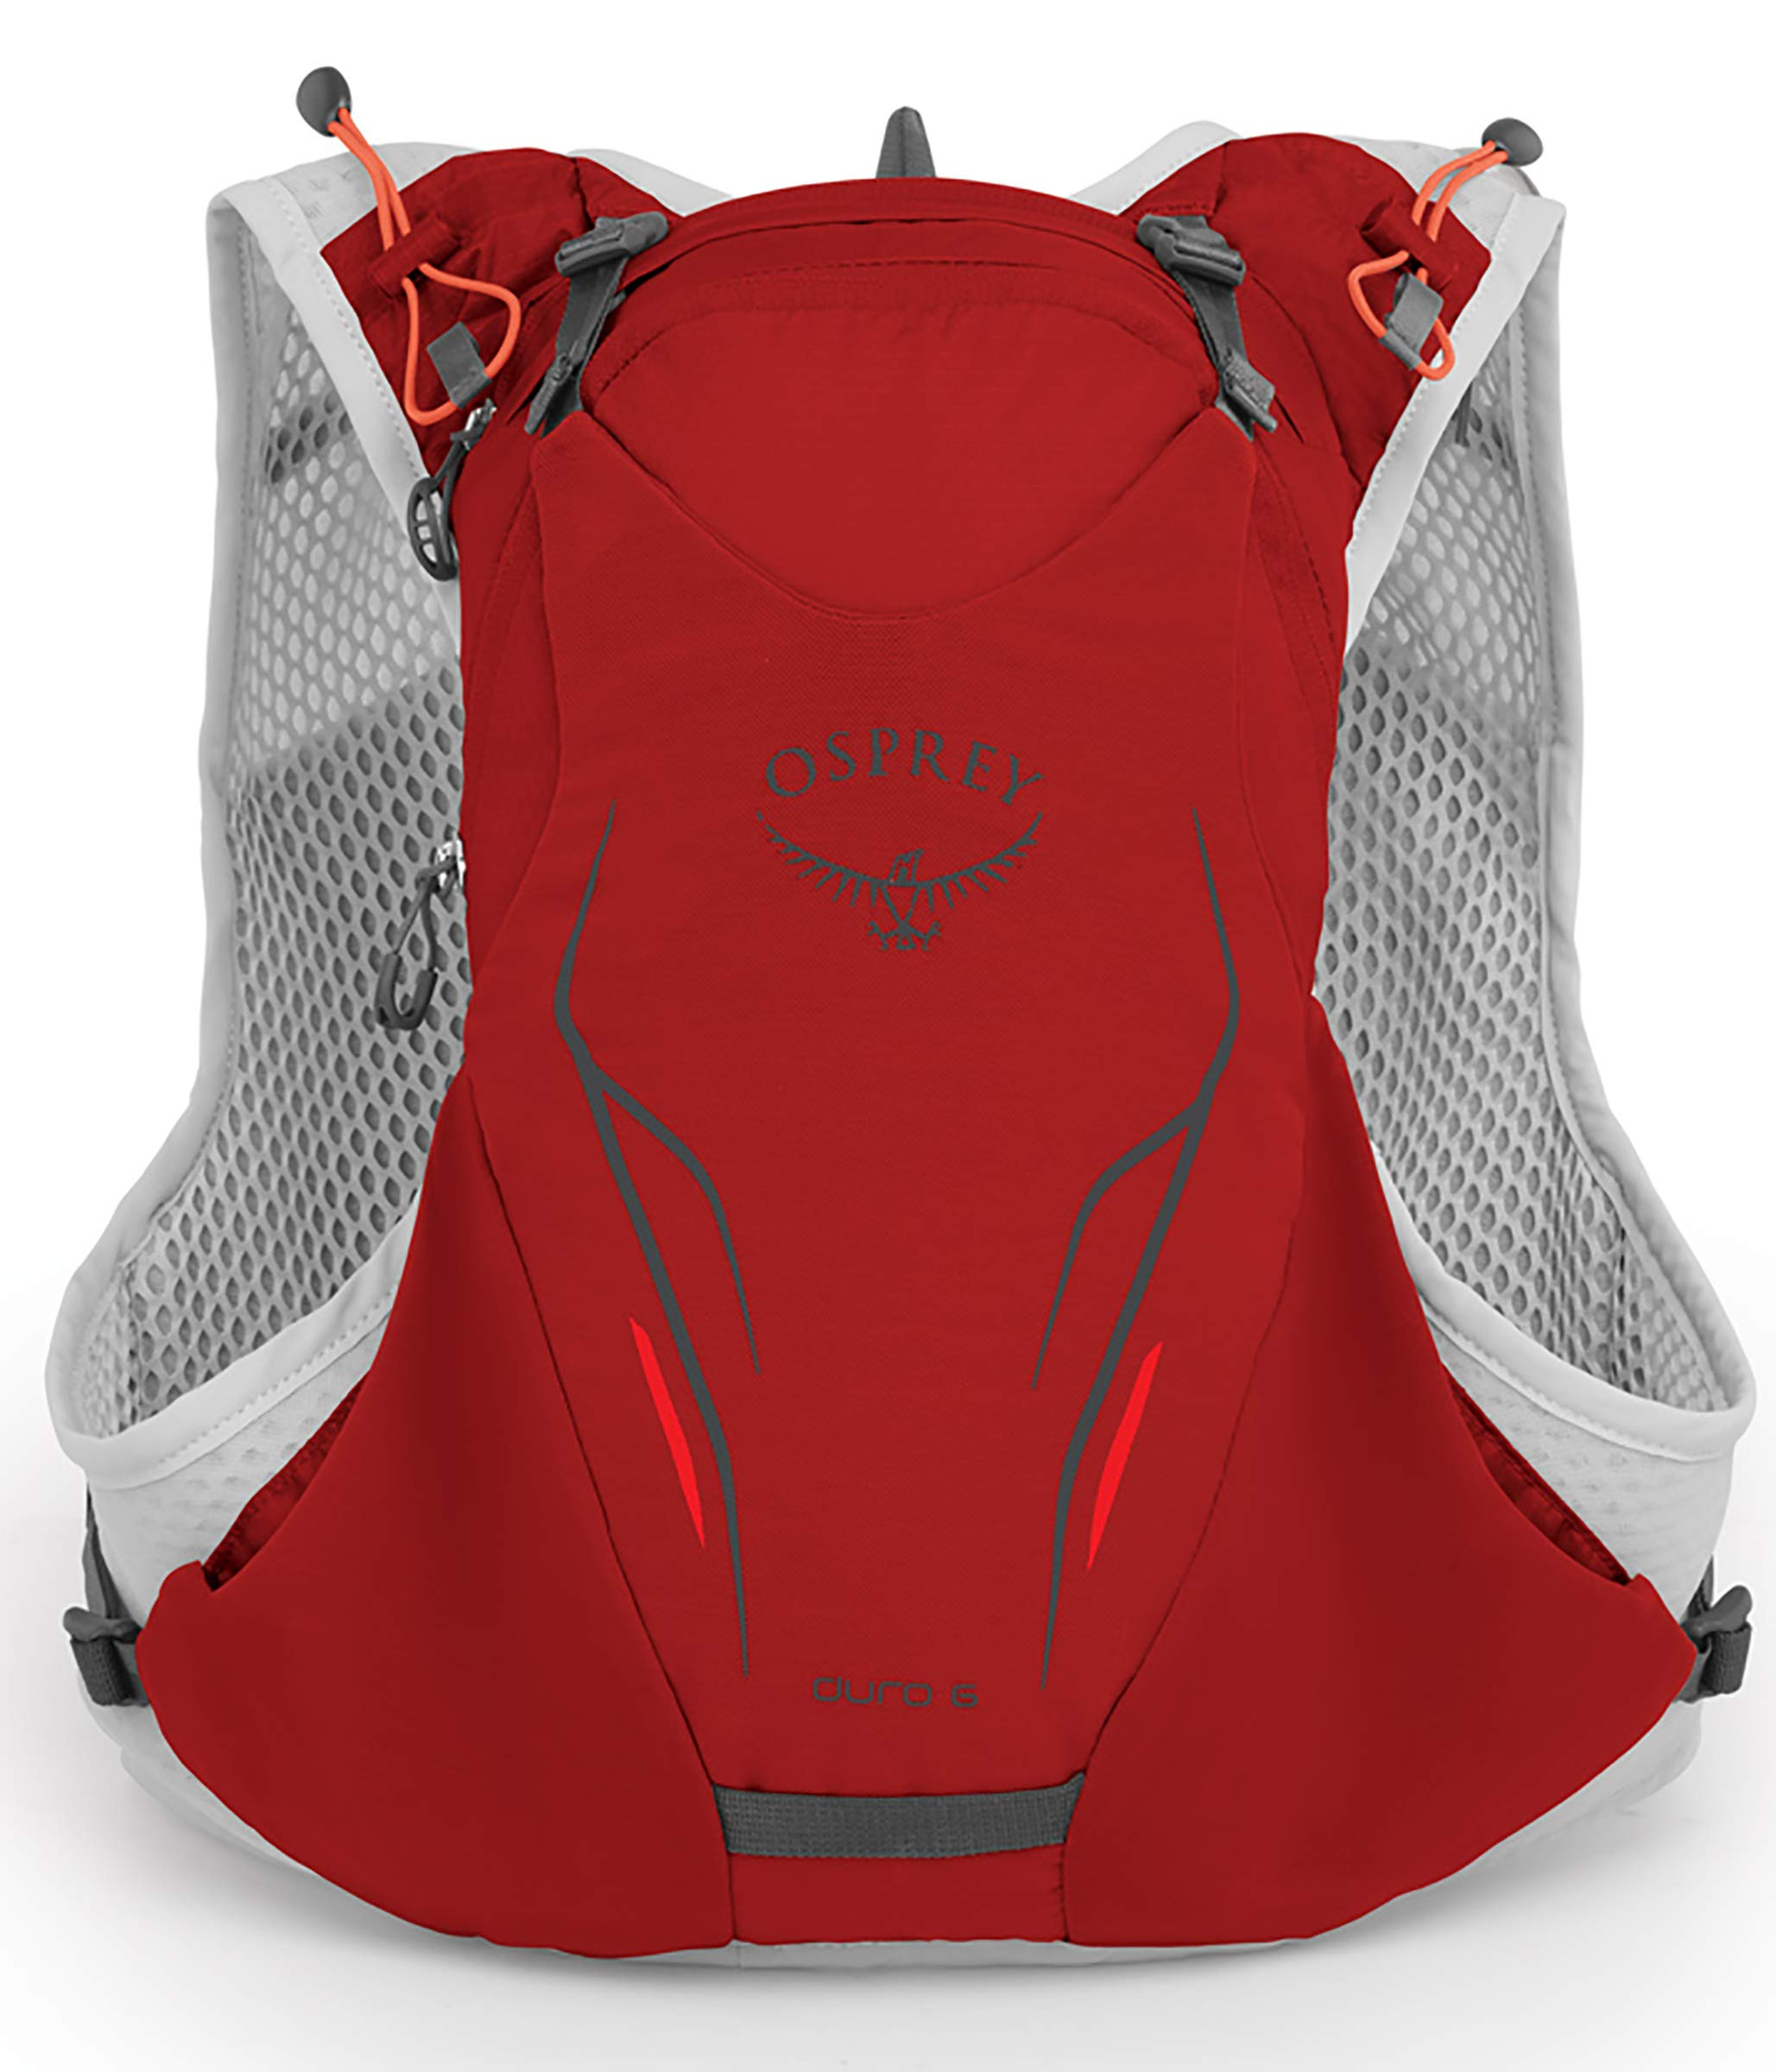 Osprey Packs Duro 6 Running Hydration Vest, Phoenix Red, Small/Medium by Osprey (Image #2)